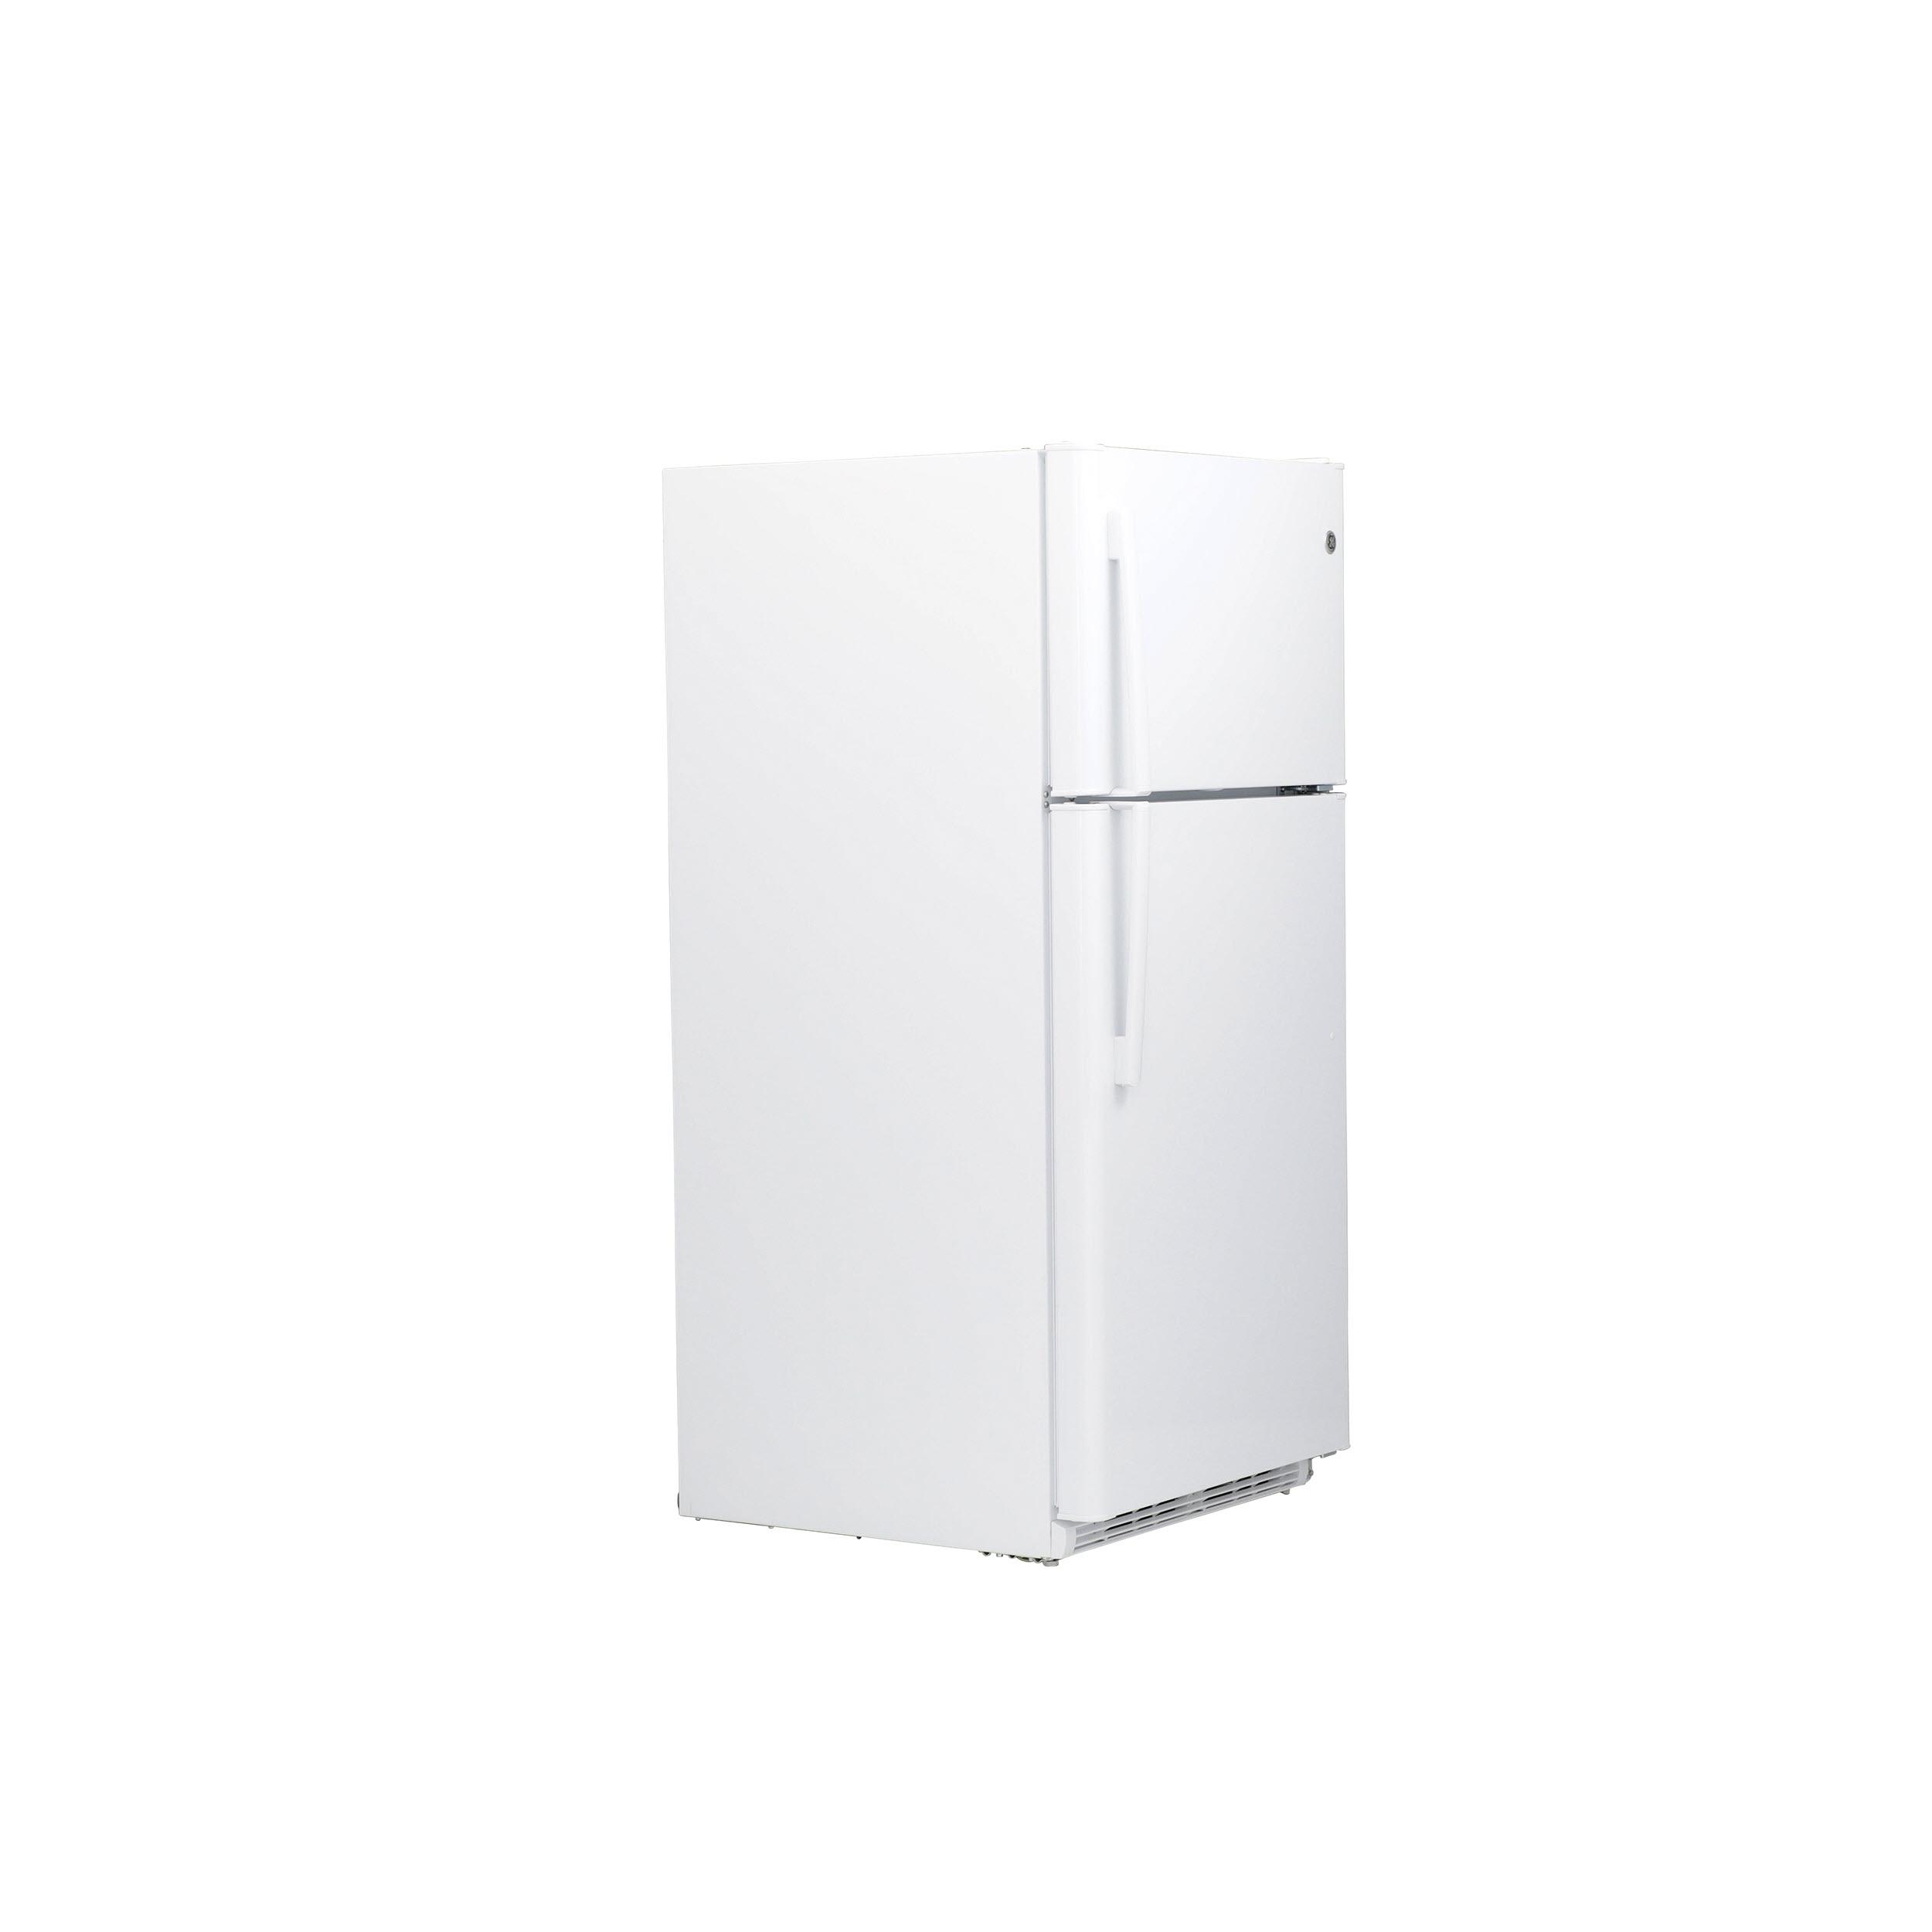 Model: GTS21FGKWW | GE GE® 20.8 Cu. Ft. Top-Freezer Refrigerator